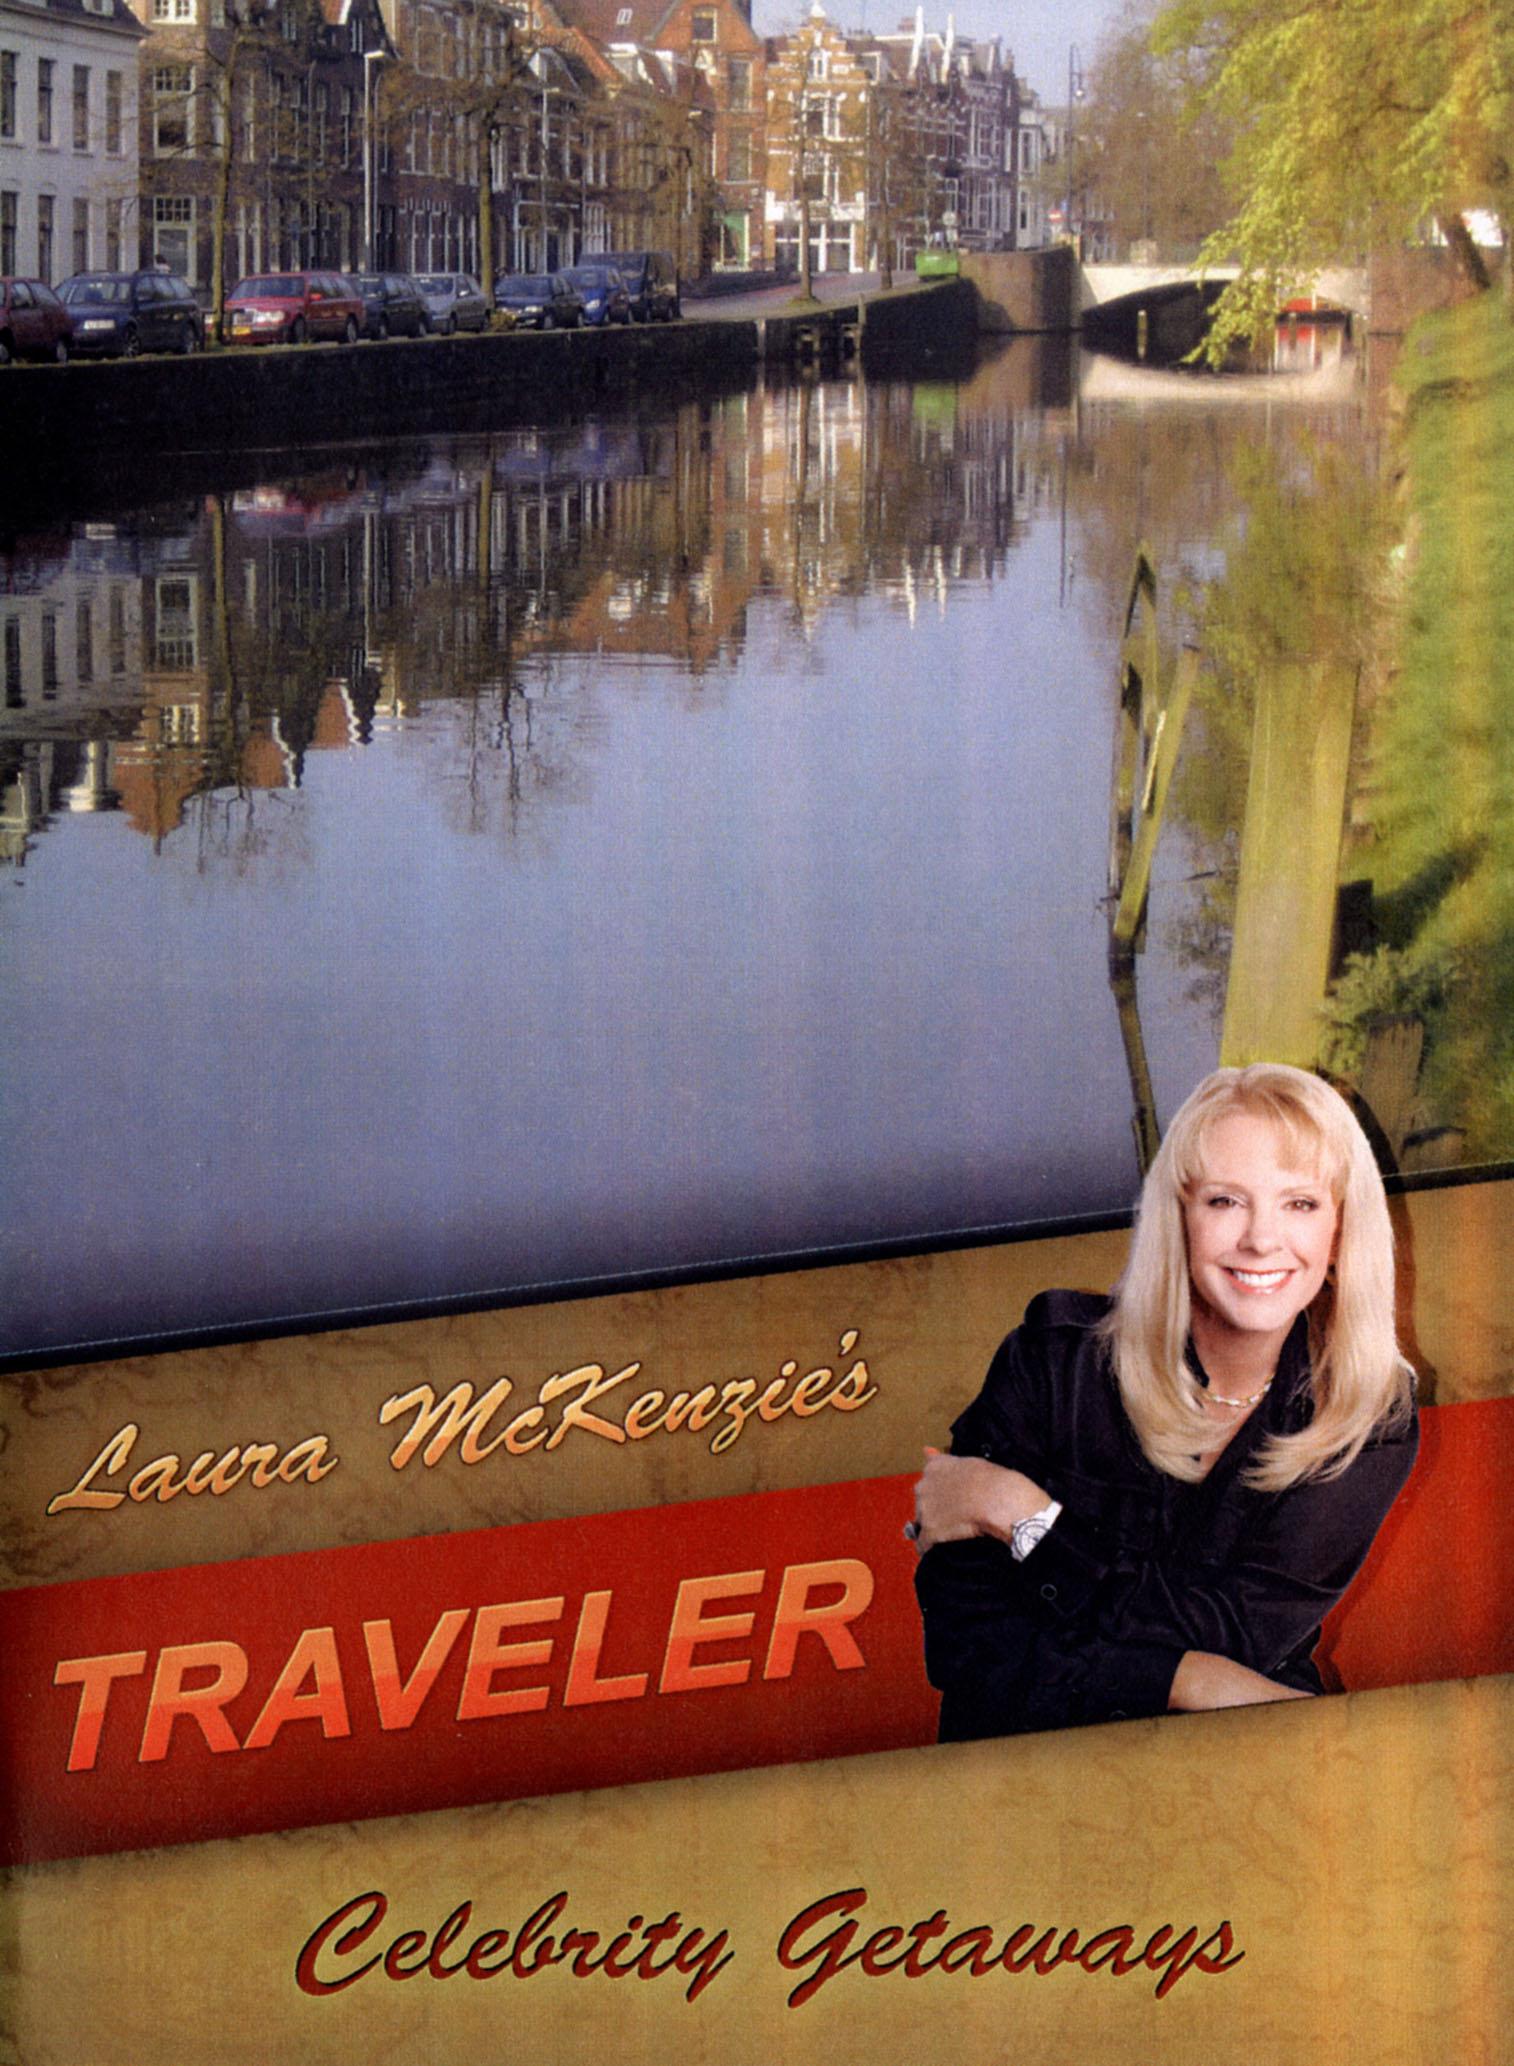 Laura McKenzie's Traveler: Celebrity Getaways